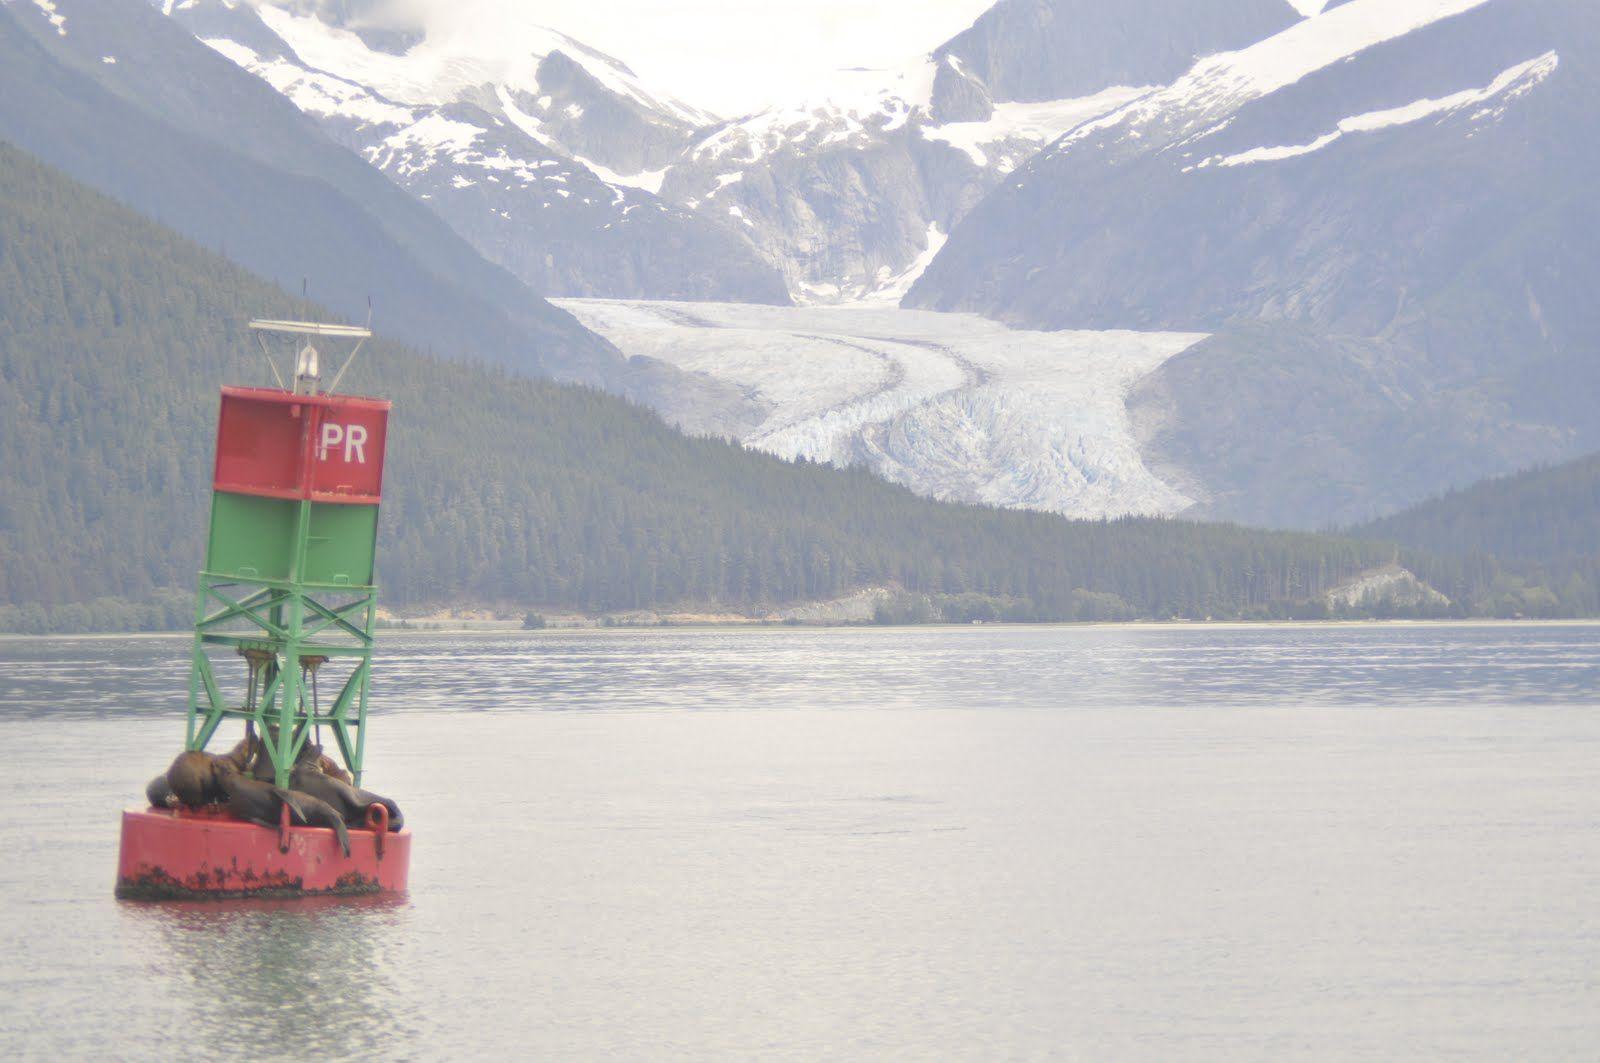 Michal & Family in North America: אלסקה - החצי השני של ההפלגה